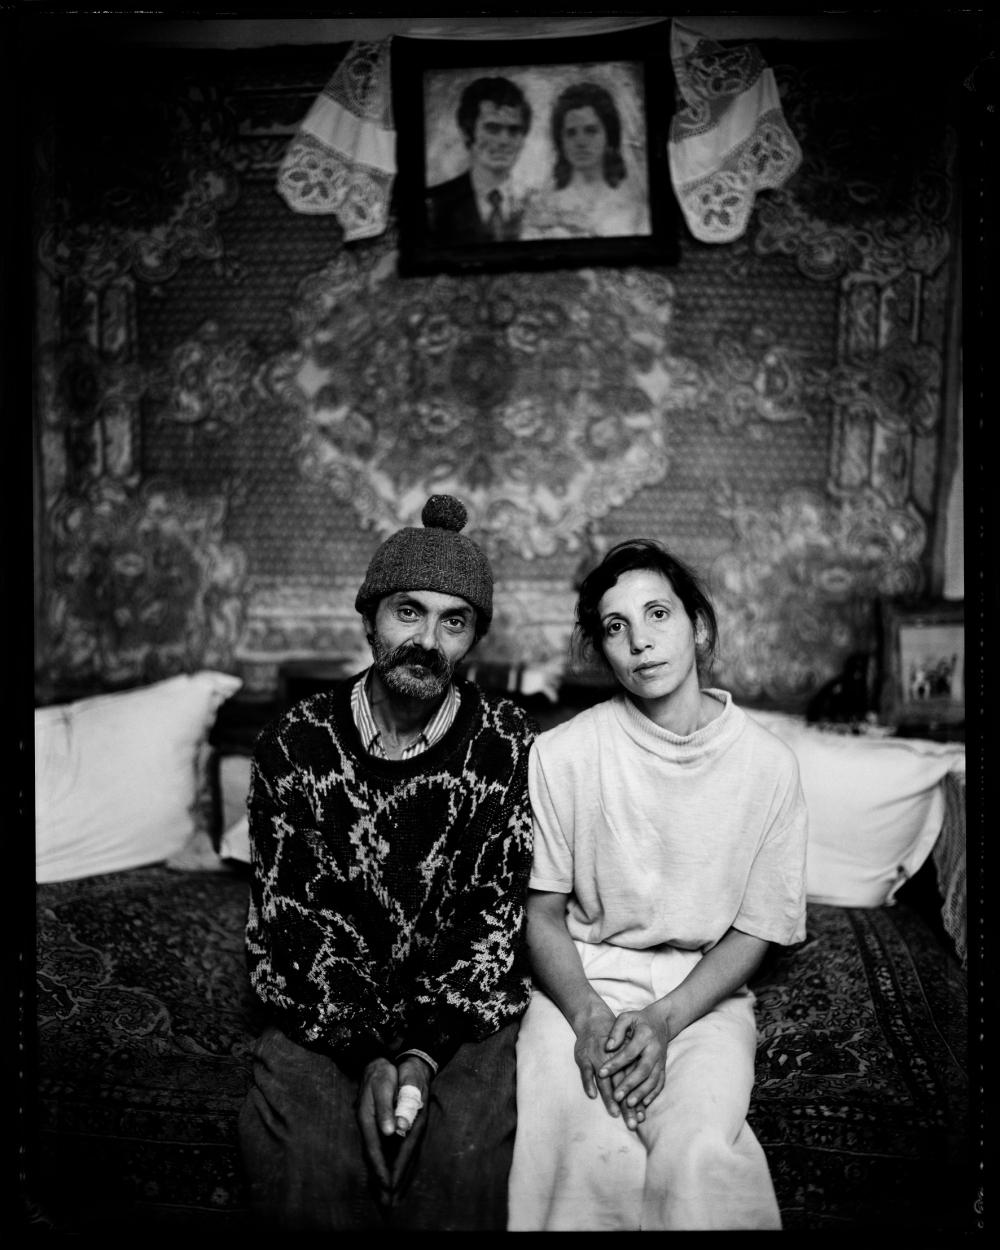 Carol Czanca, 43 ans et Katalin Otvos, 41 ans.Cluj-Napoca, Roumanie 1998.